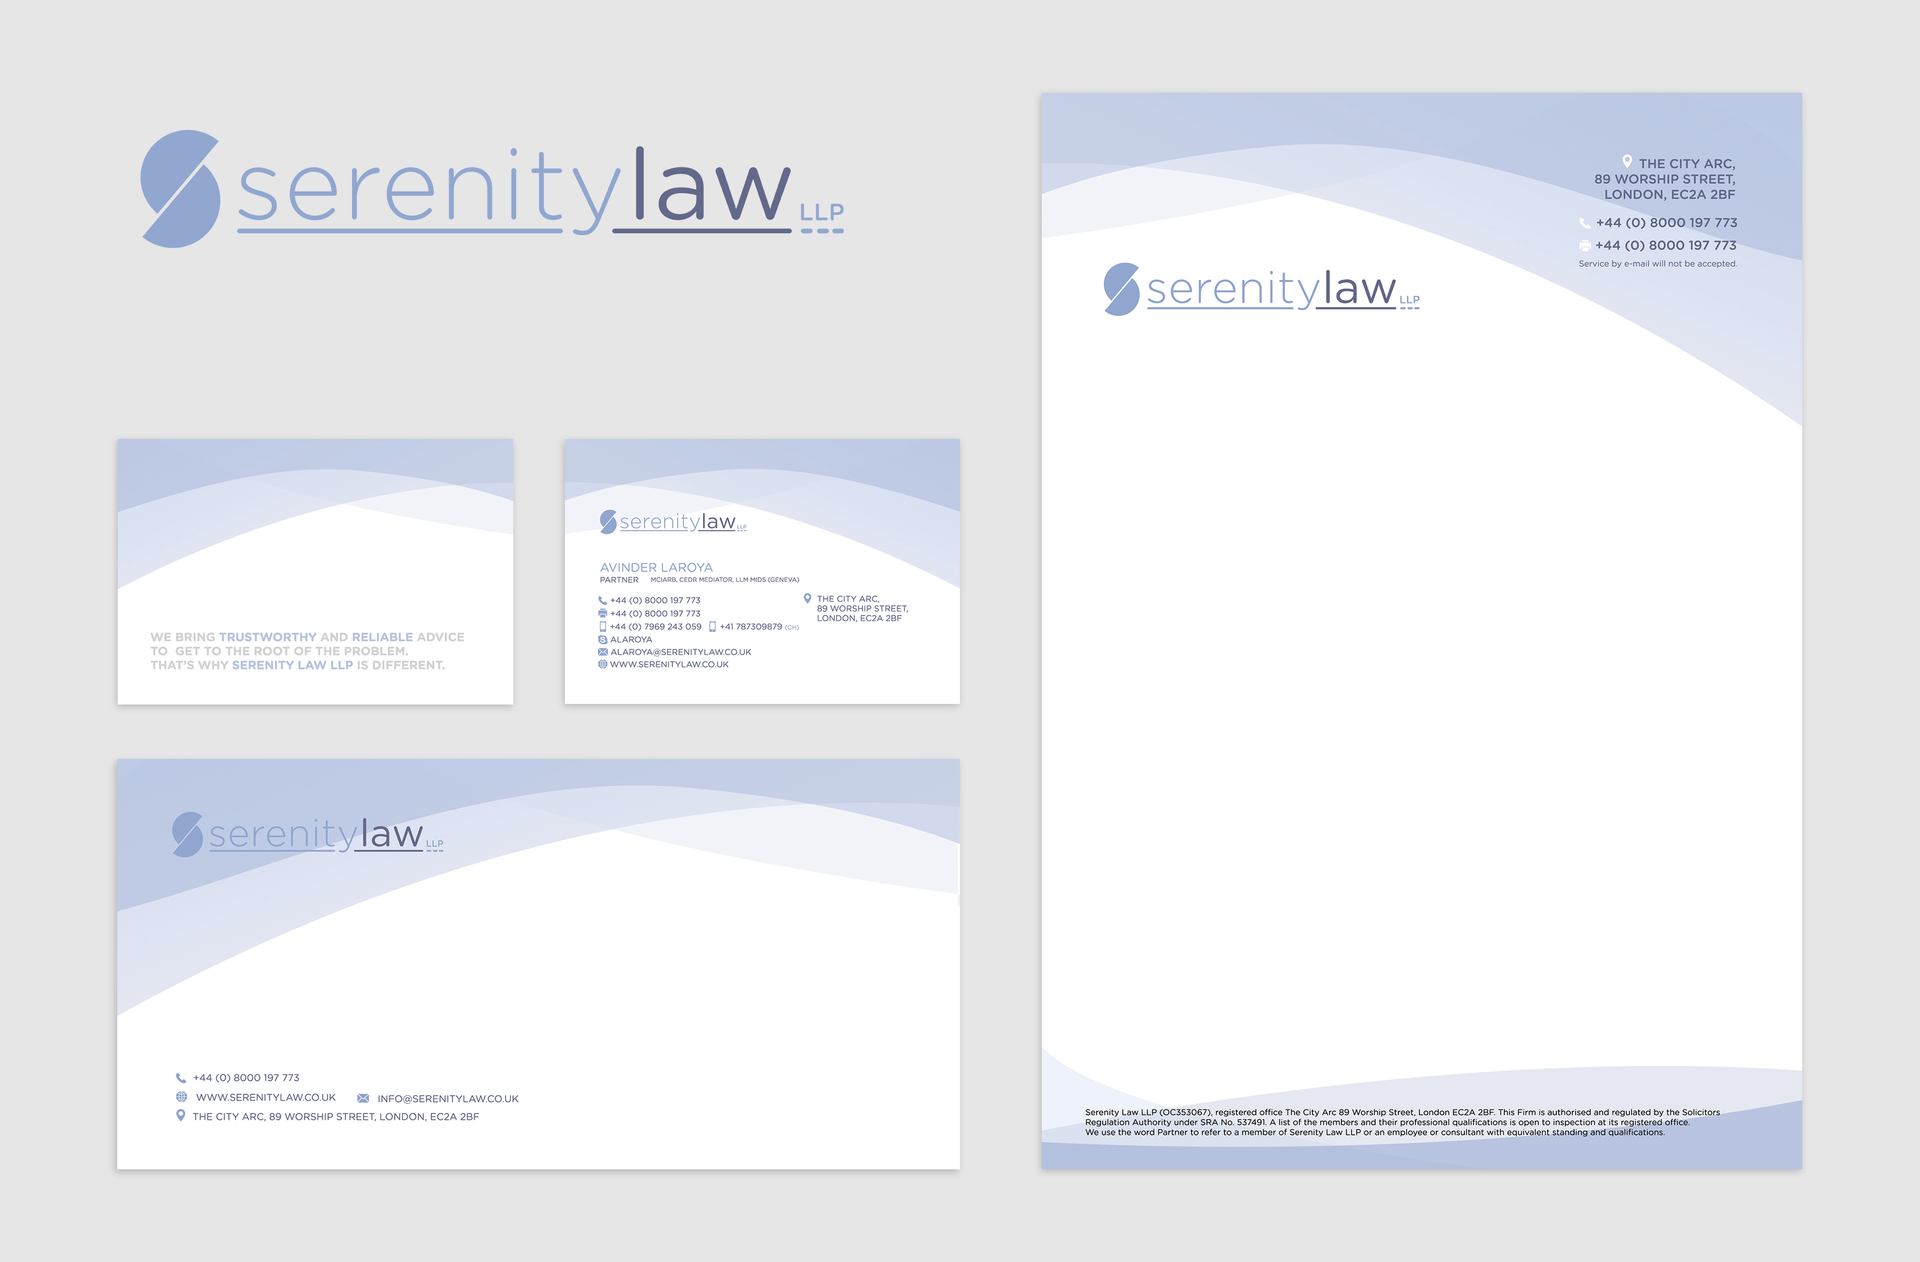 Serenity Law